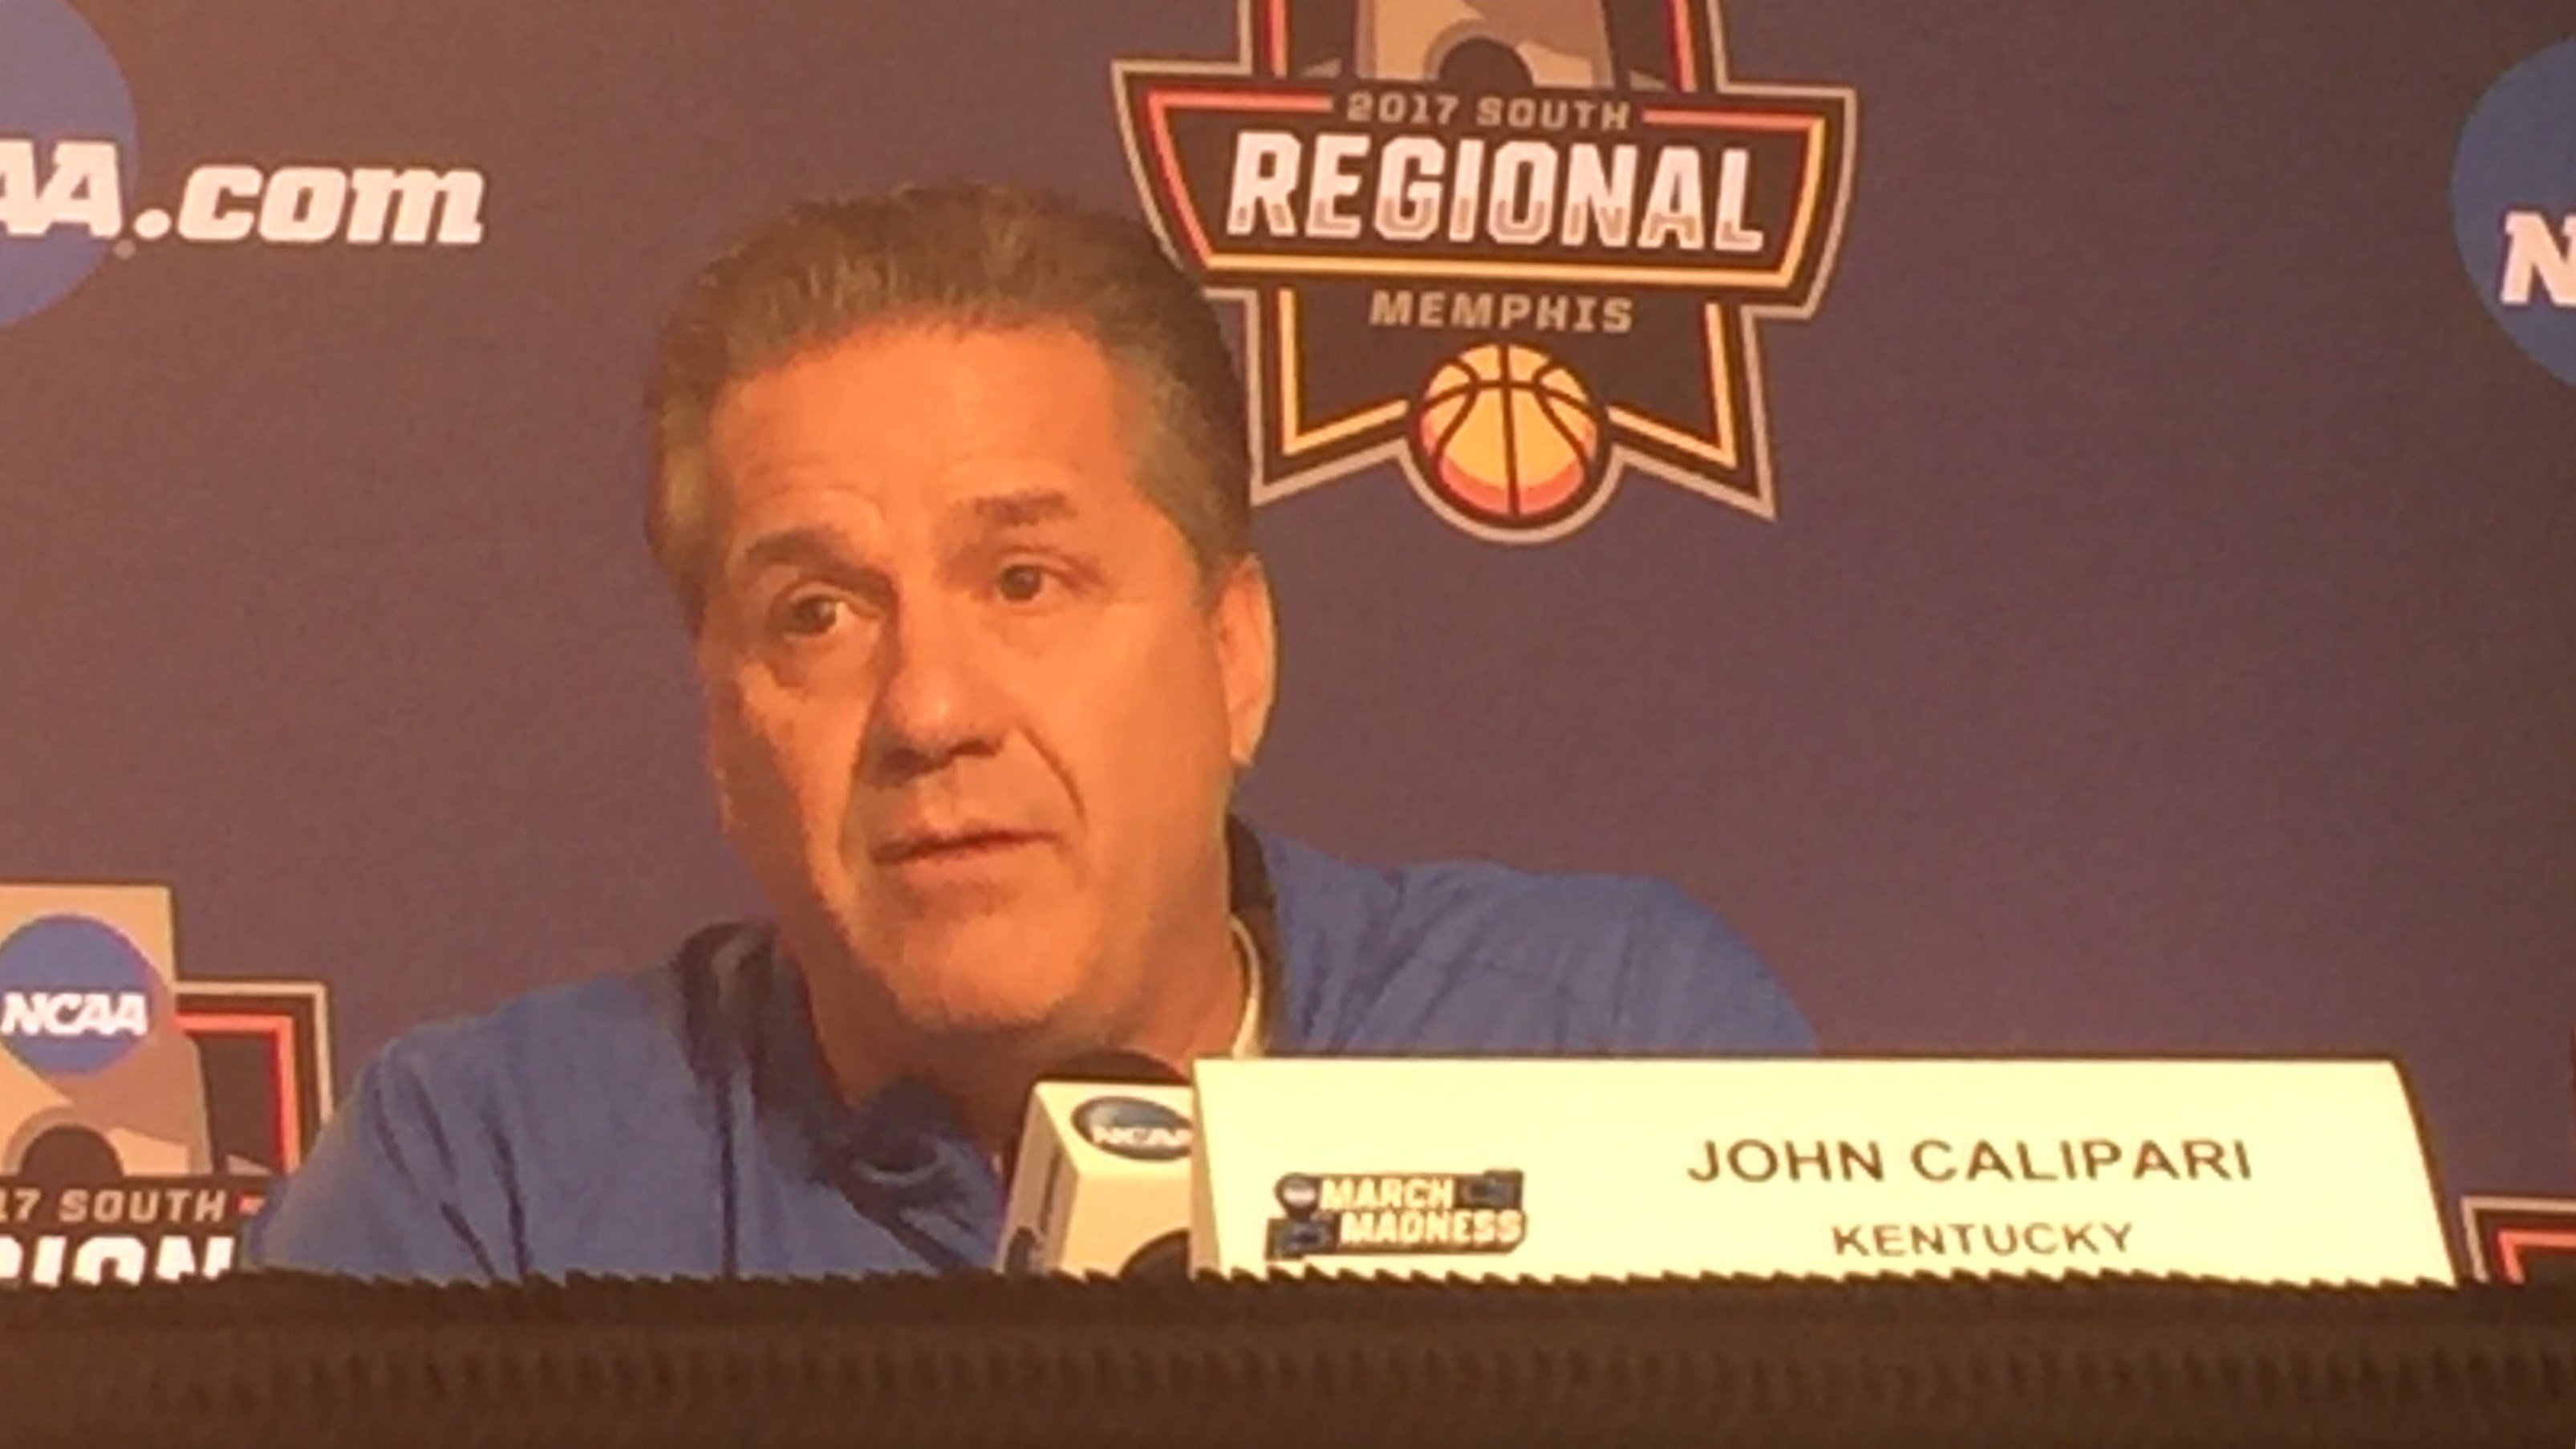 Will John Calipari's streak of producing at least one NBA Draft Top 10 pick end next spring?